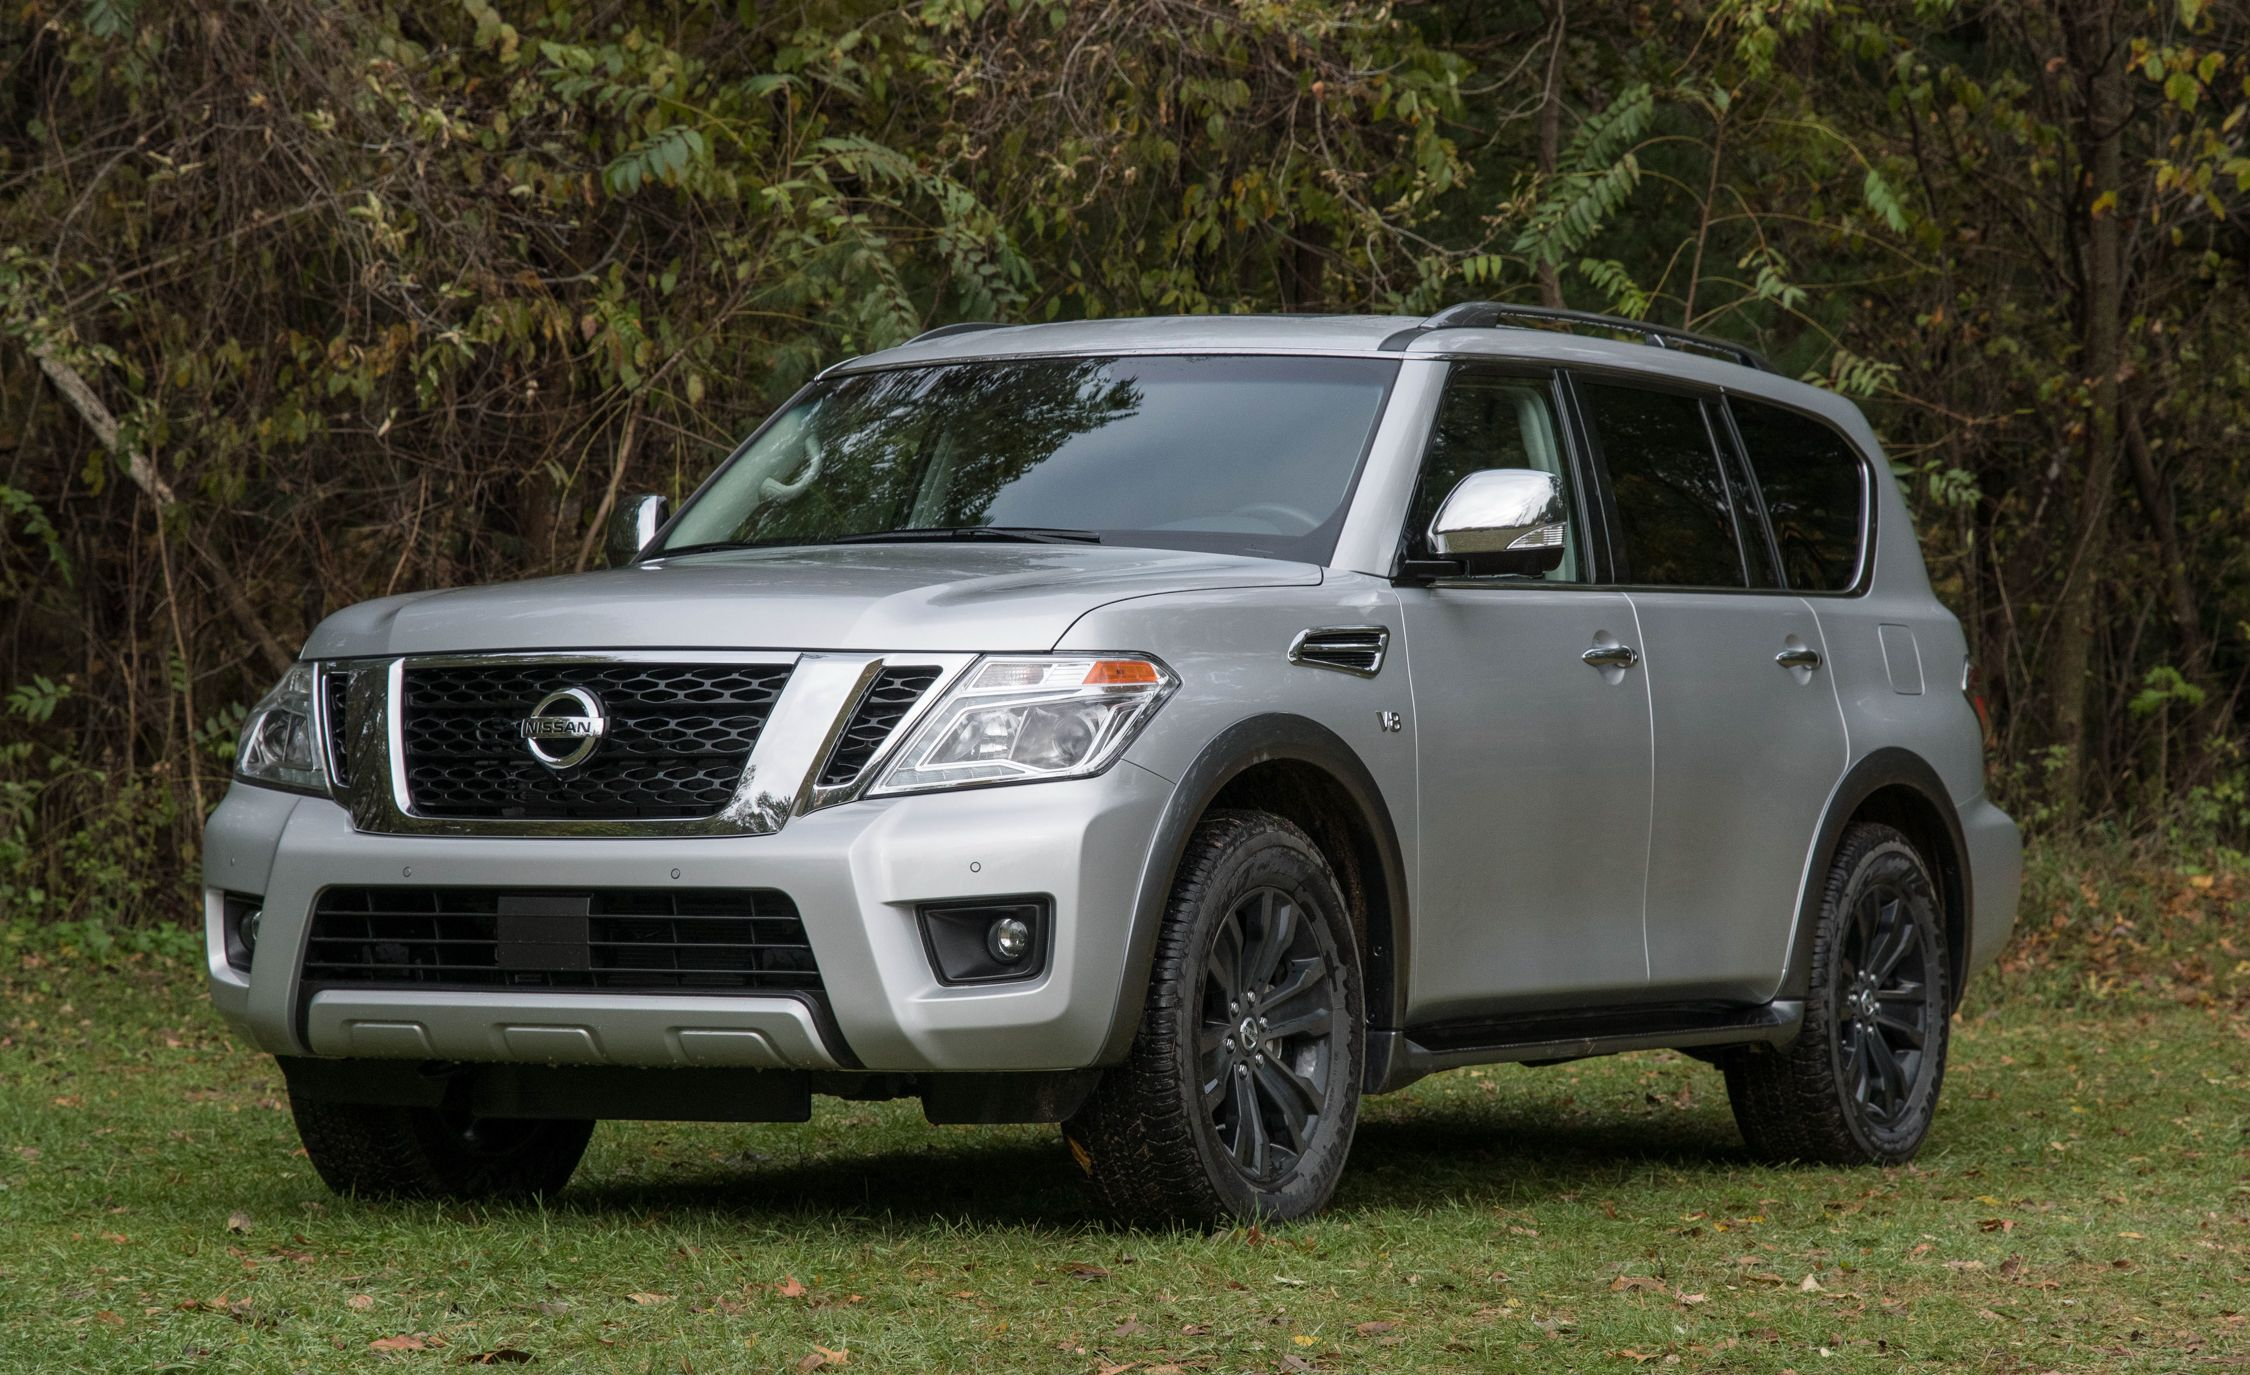 2017 Nissan Armada Configurations >> 2019 Nissan Armada